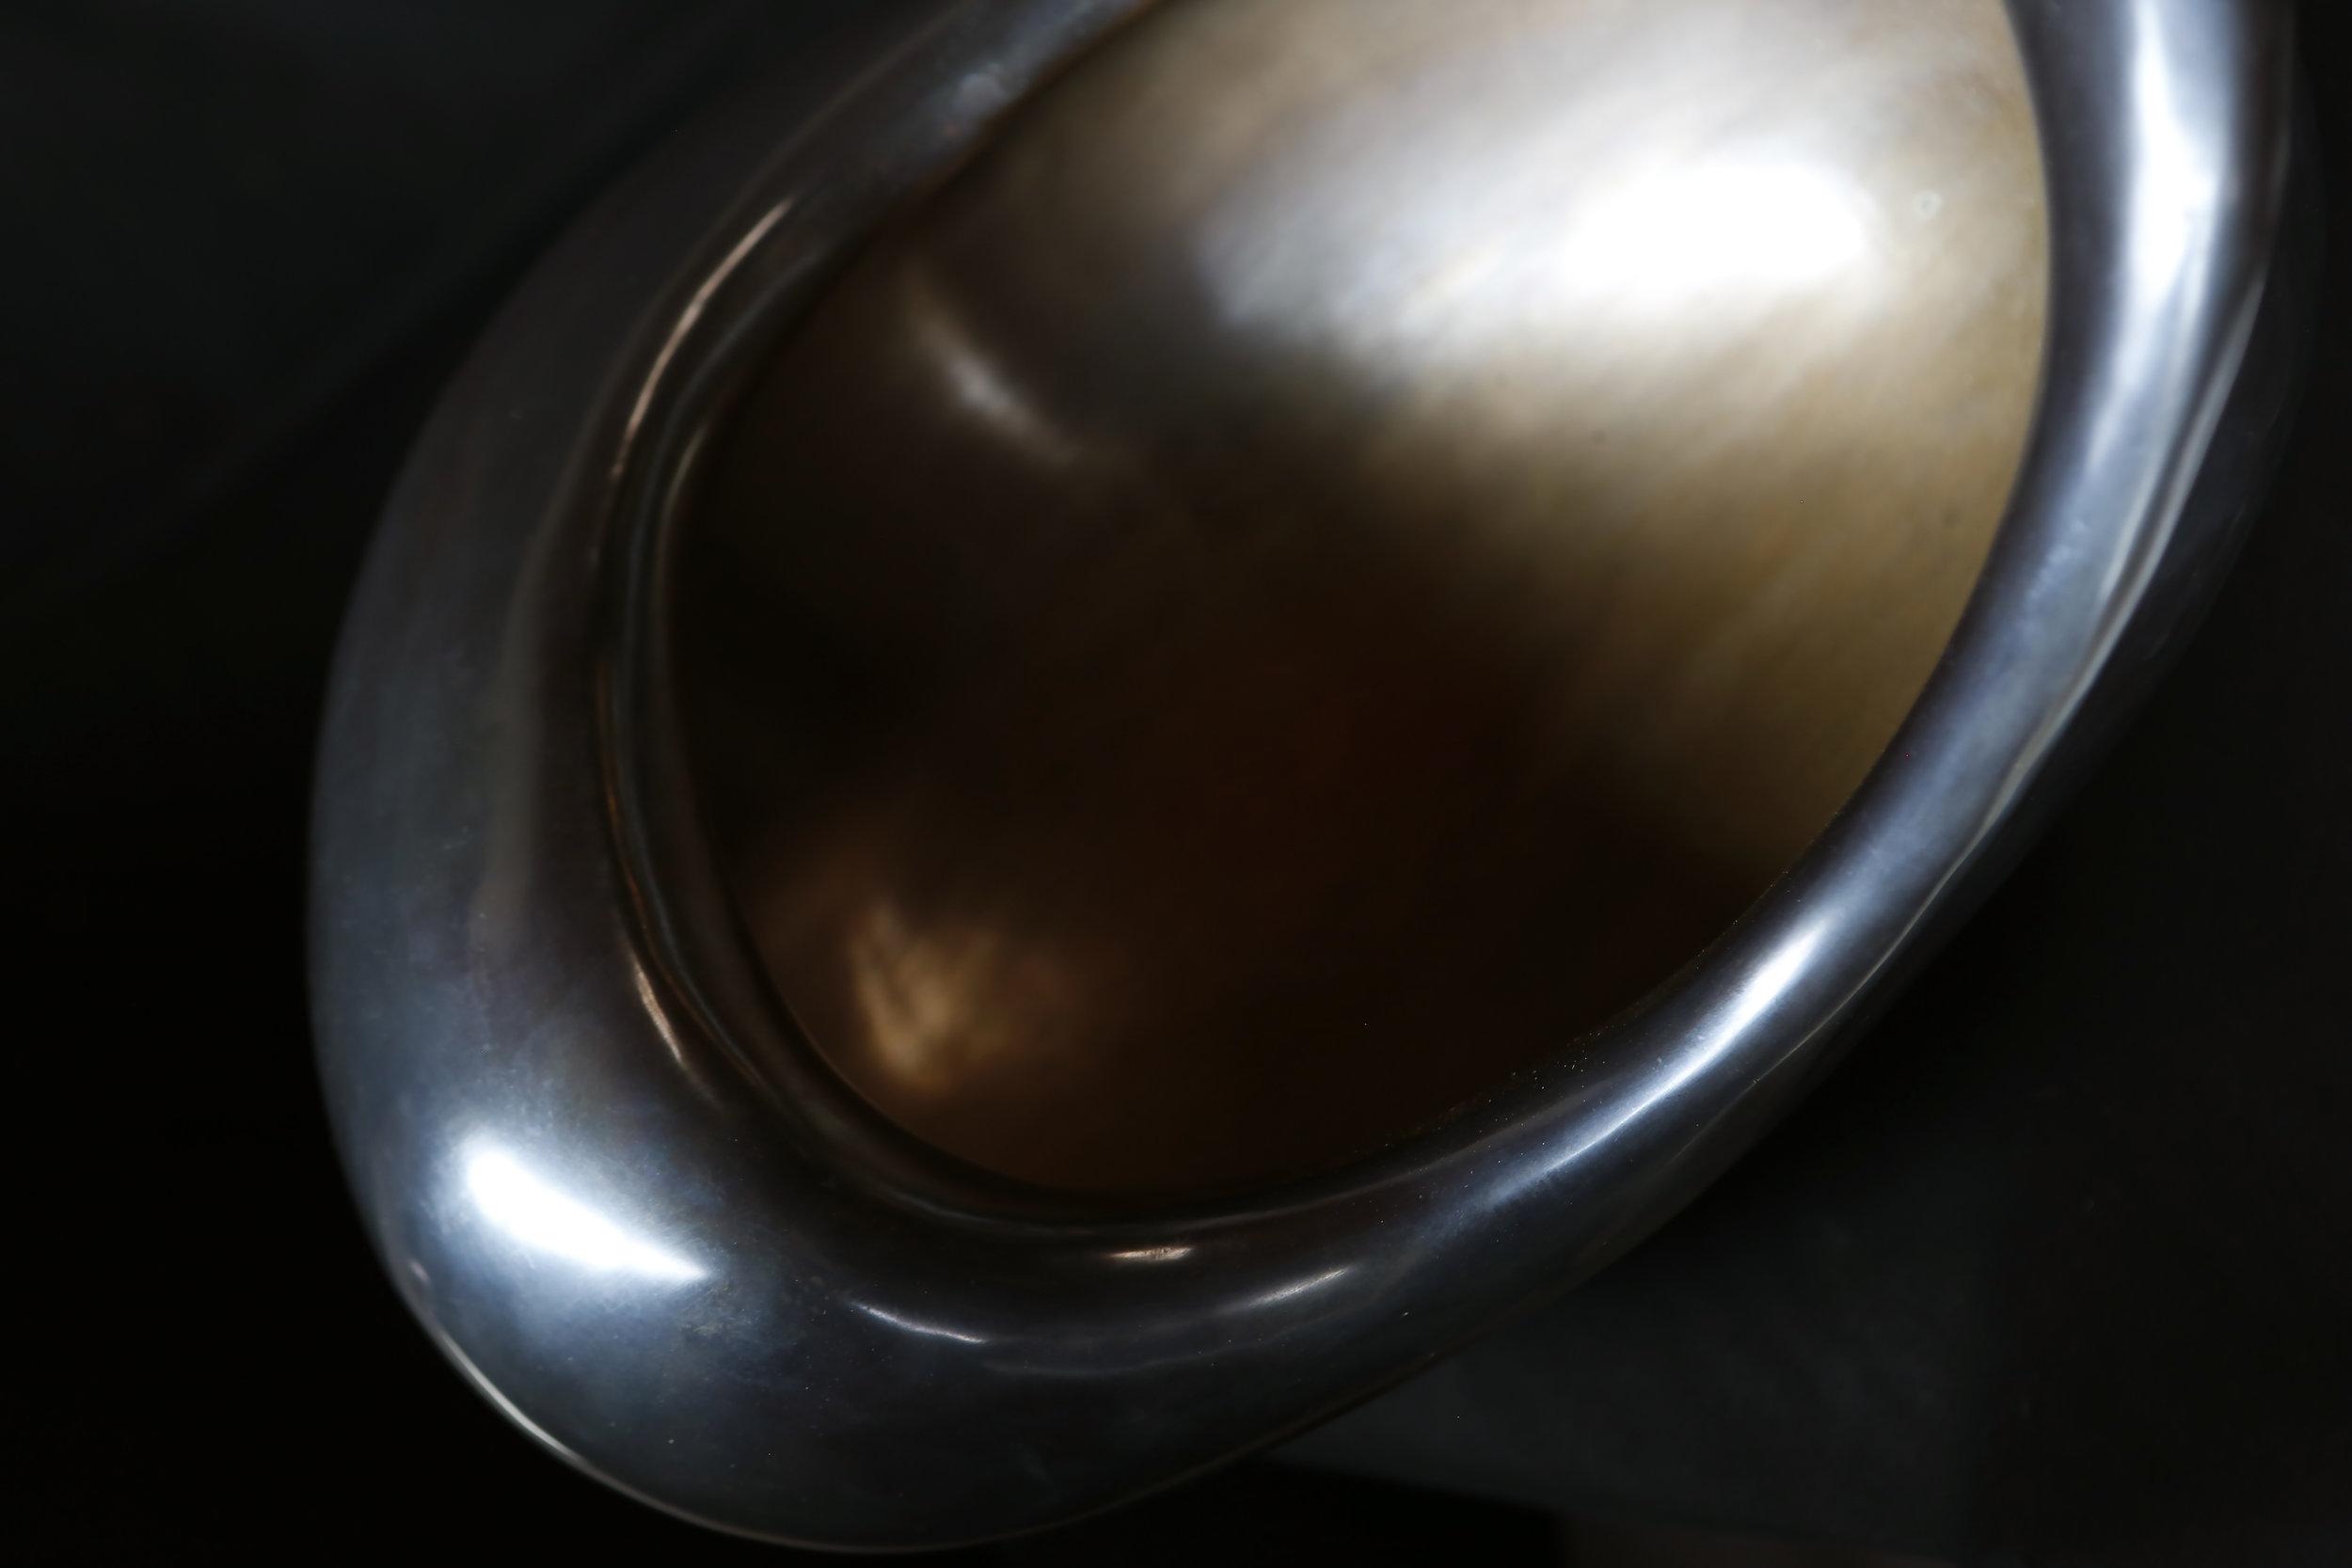 JMA_heavy_as_hell_bowl_fromjpg_63A9512.jpg